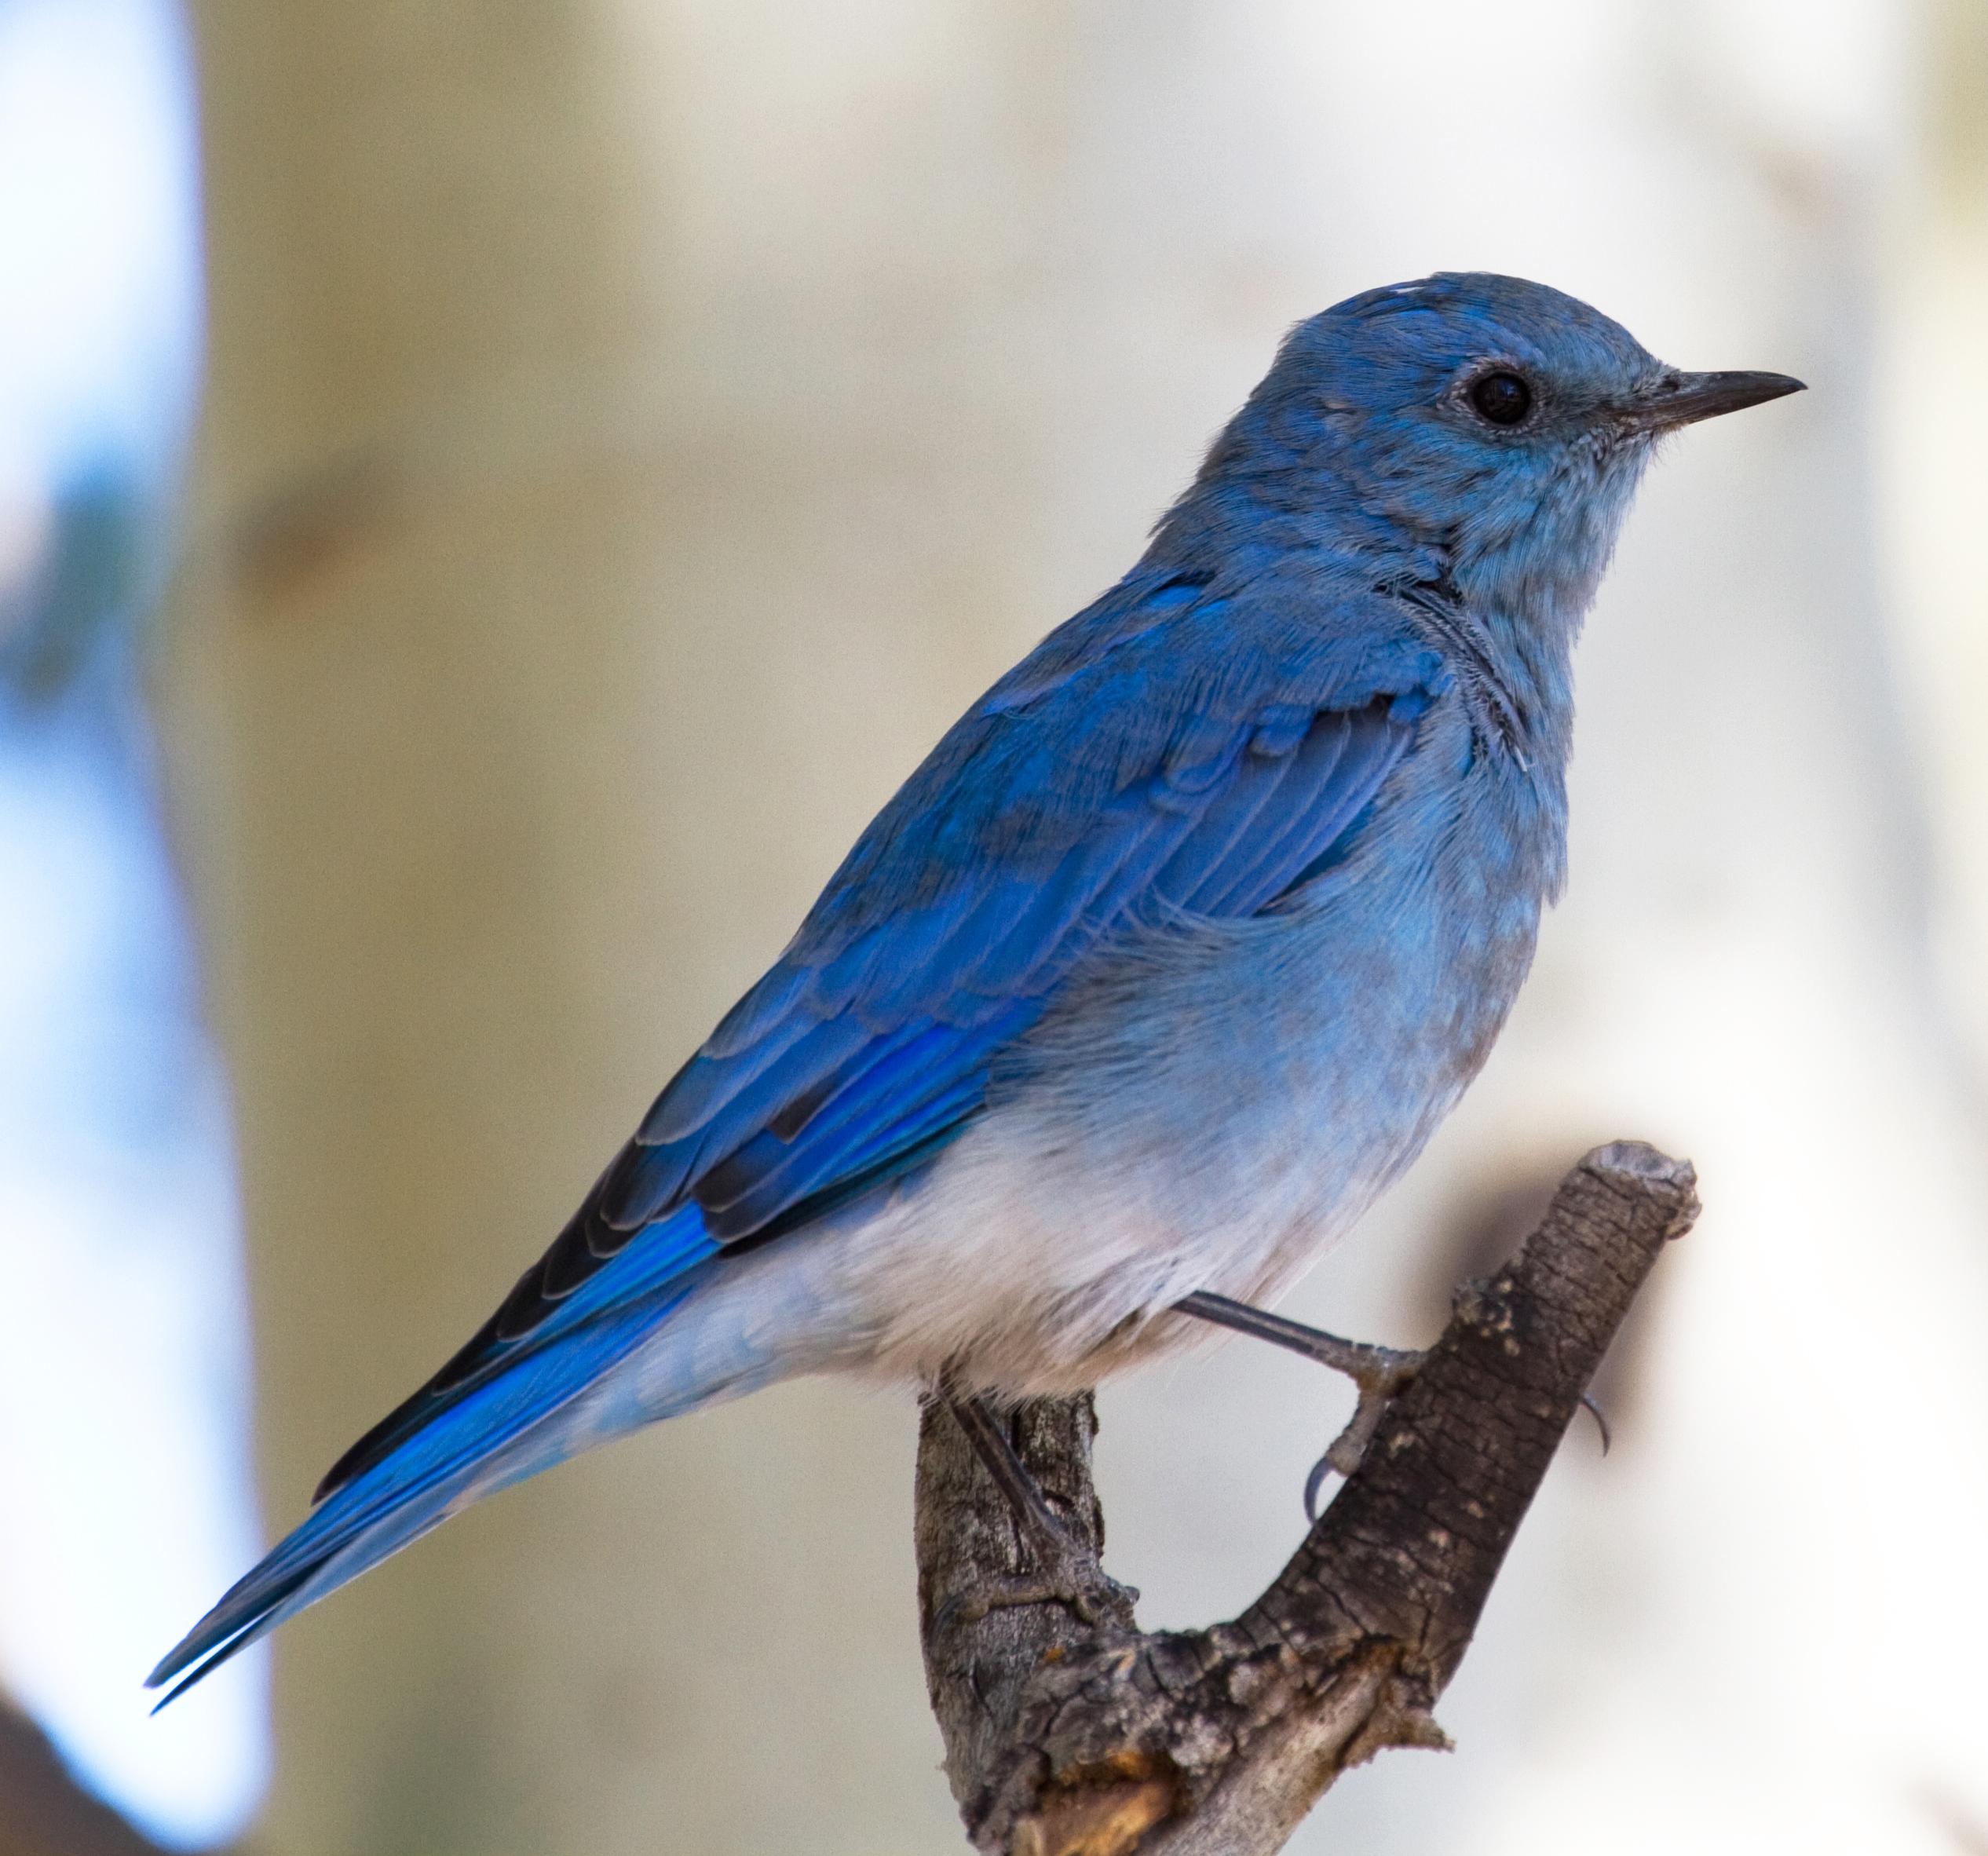 Http Commons Wikimedia Org Wiki File Mountain Blue Bird 5 8045047207 Jpg